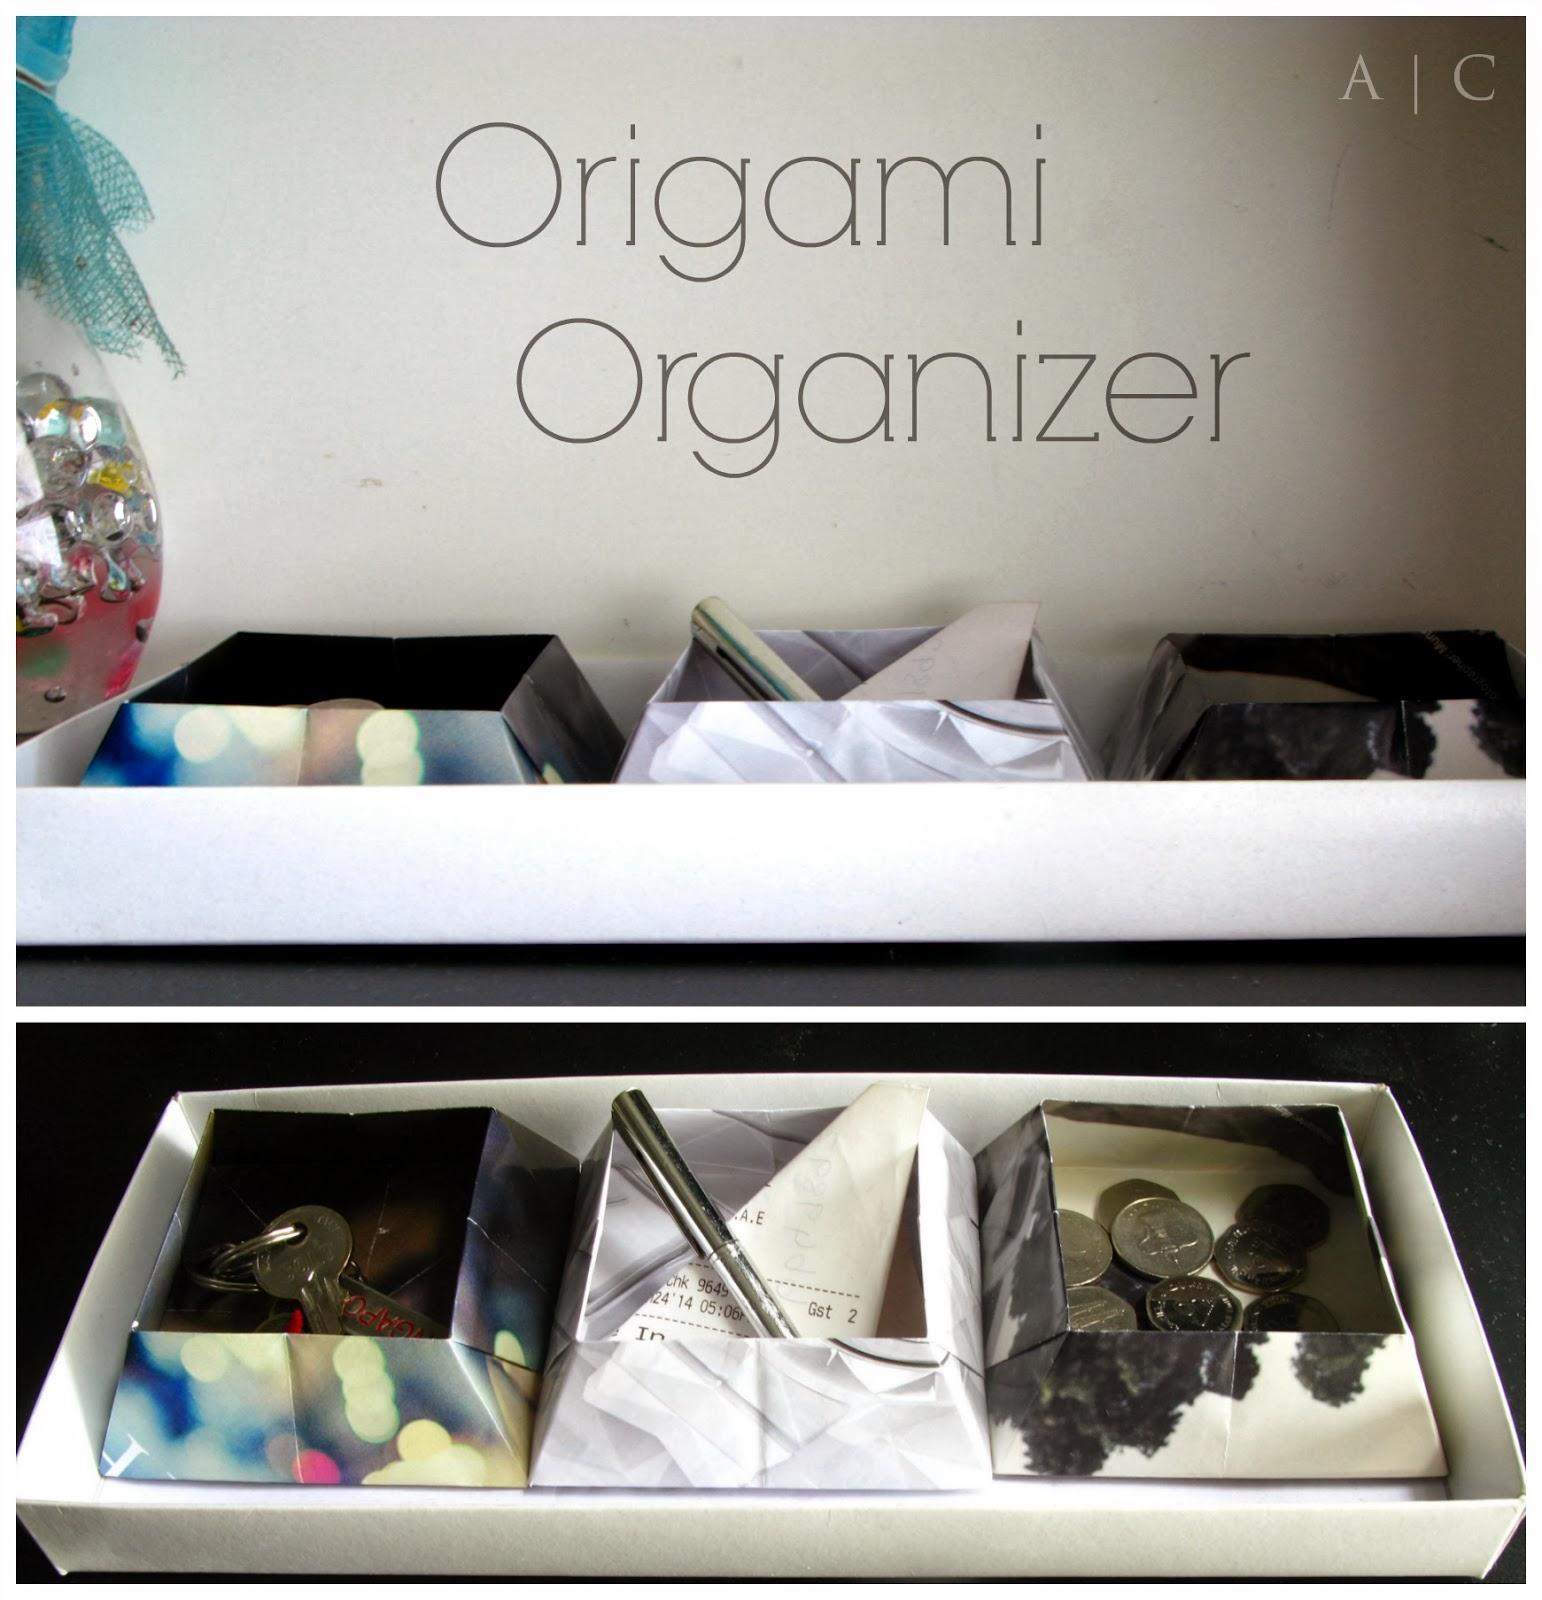 Origami organizer boxes alternate creations - Origami desk organizer ...